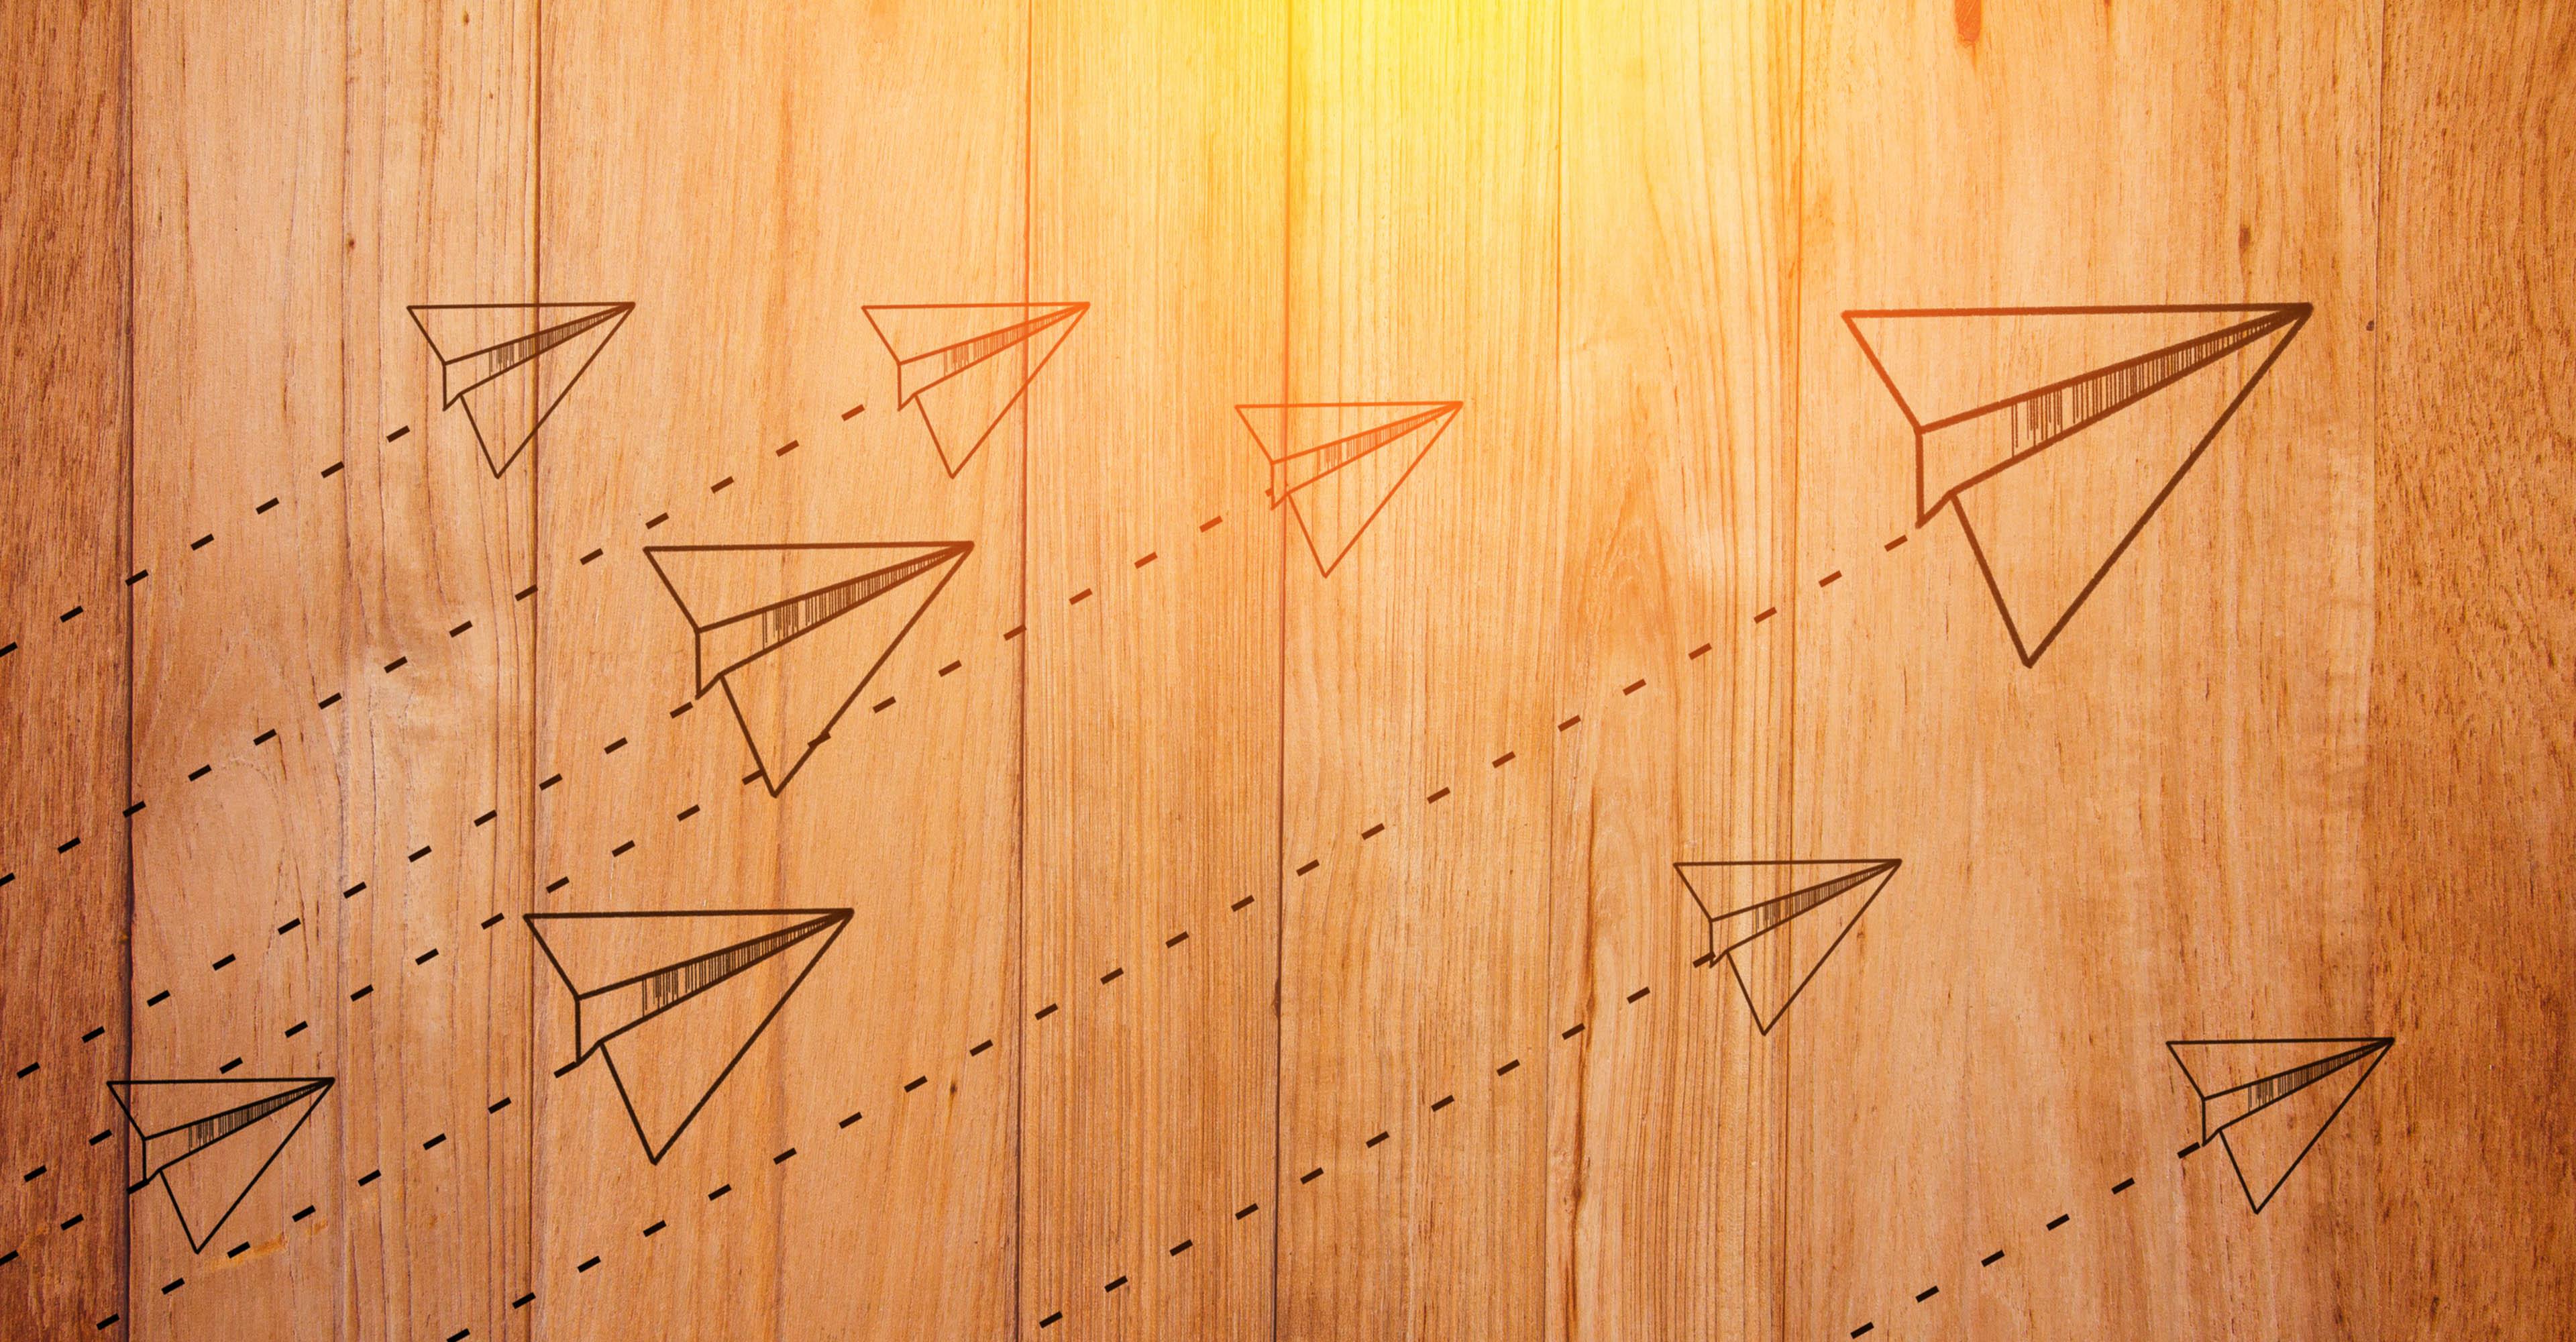 Rocket paper doodleon wooden background